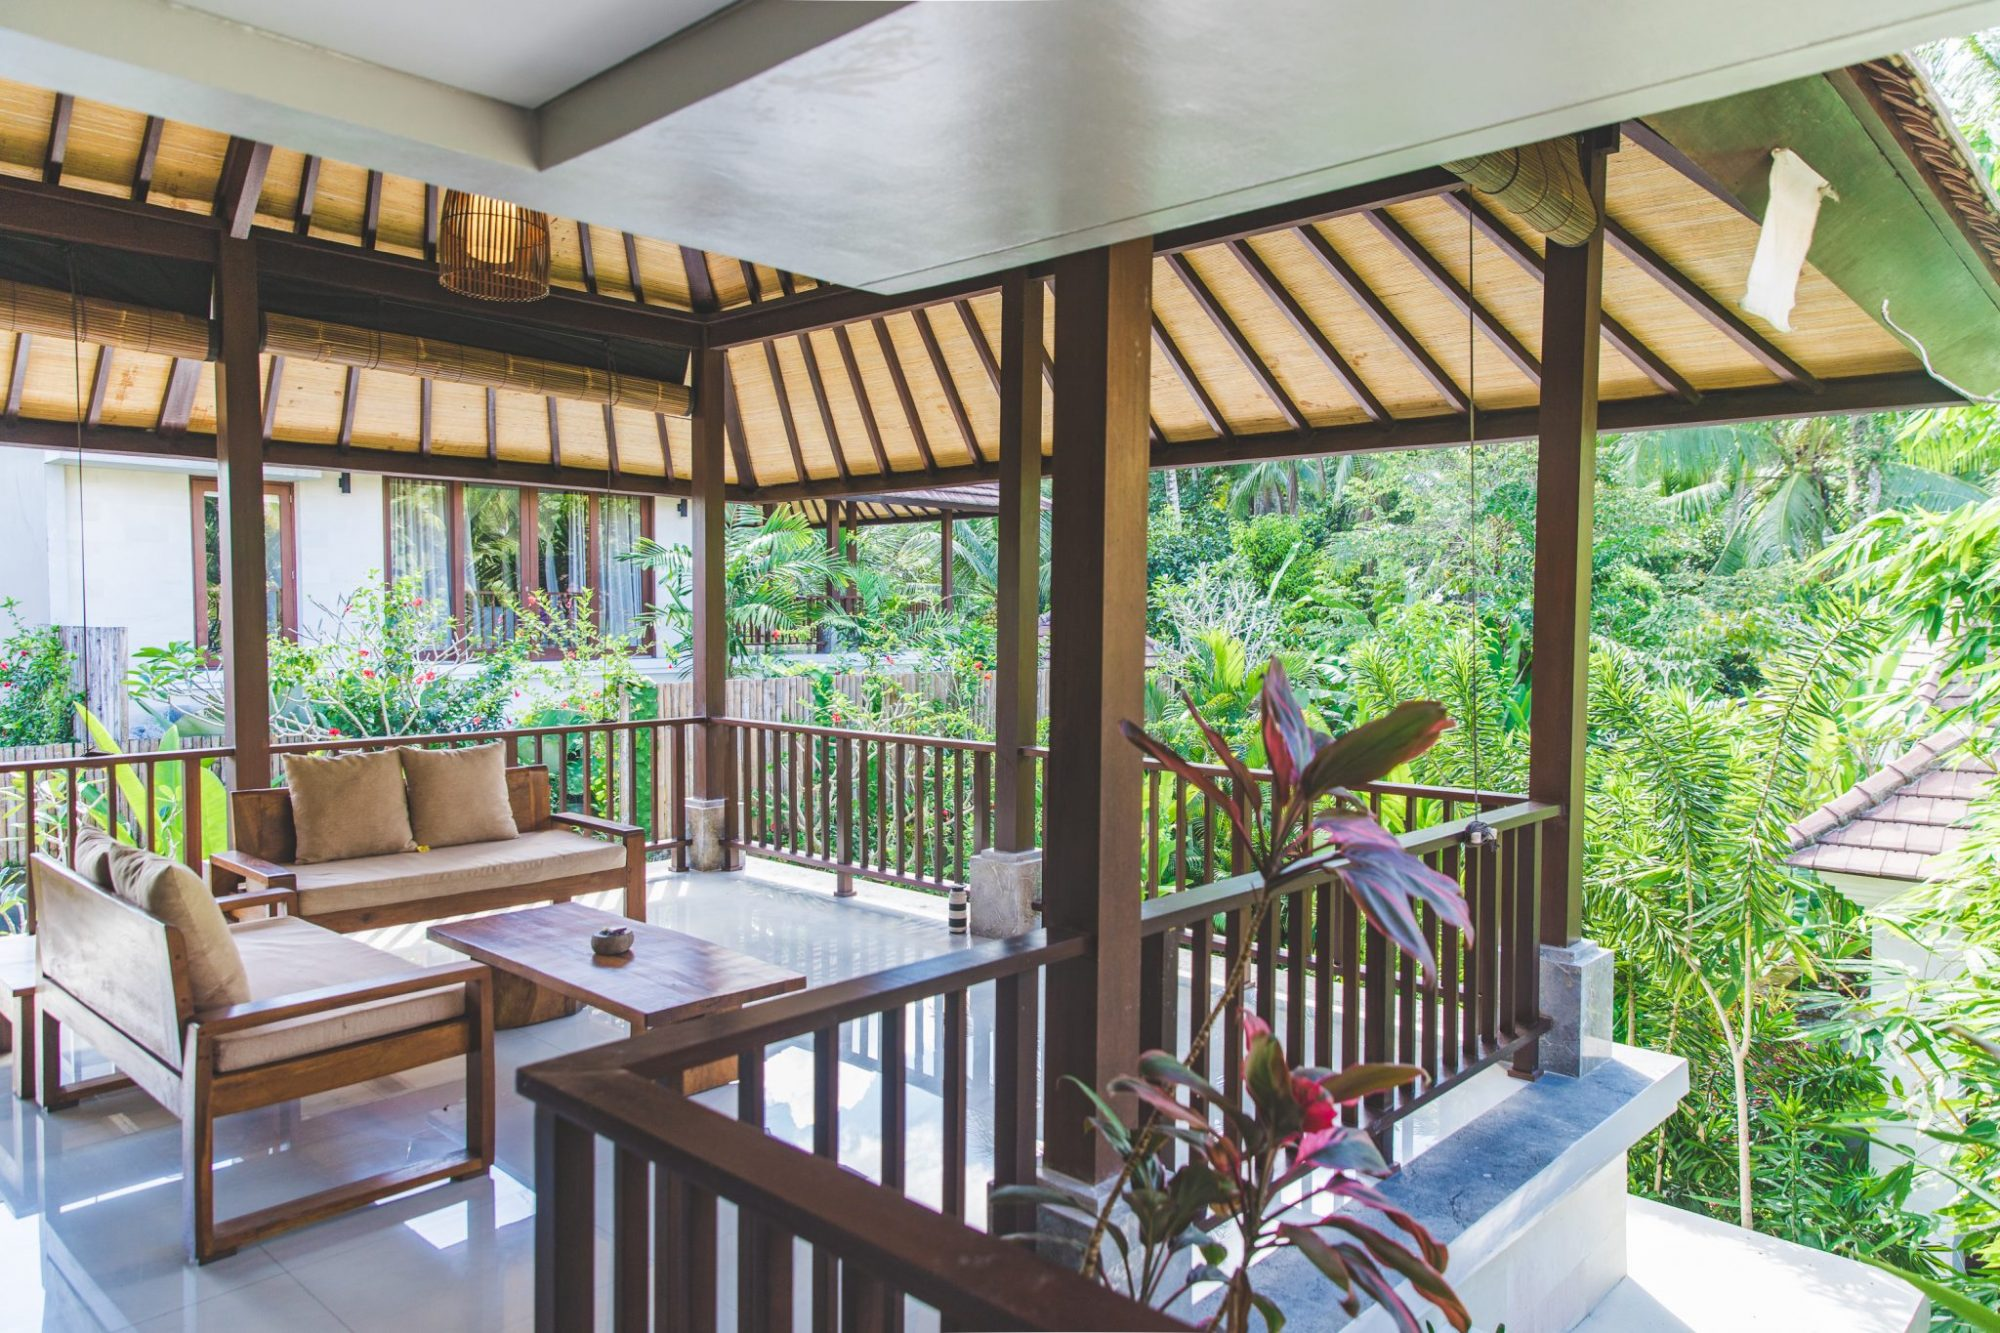 dedary kriyamaha ubud review, where to stay in ubud, bali travel guide